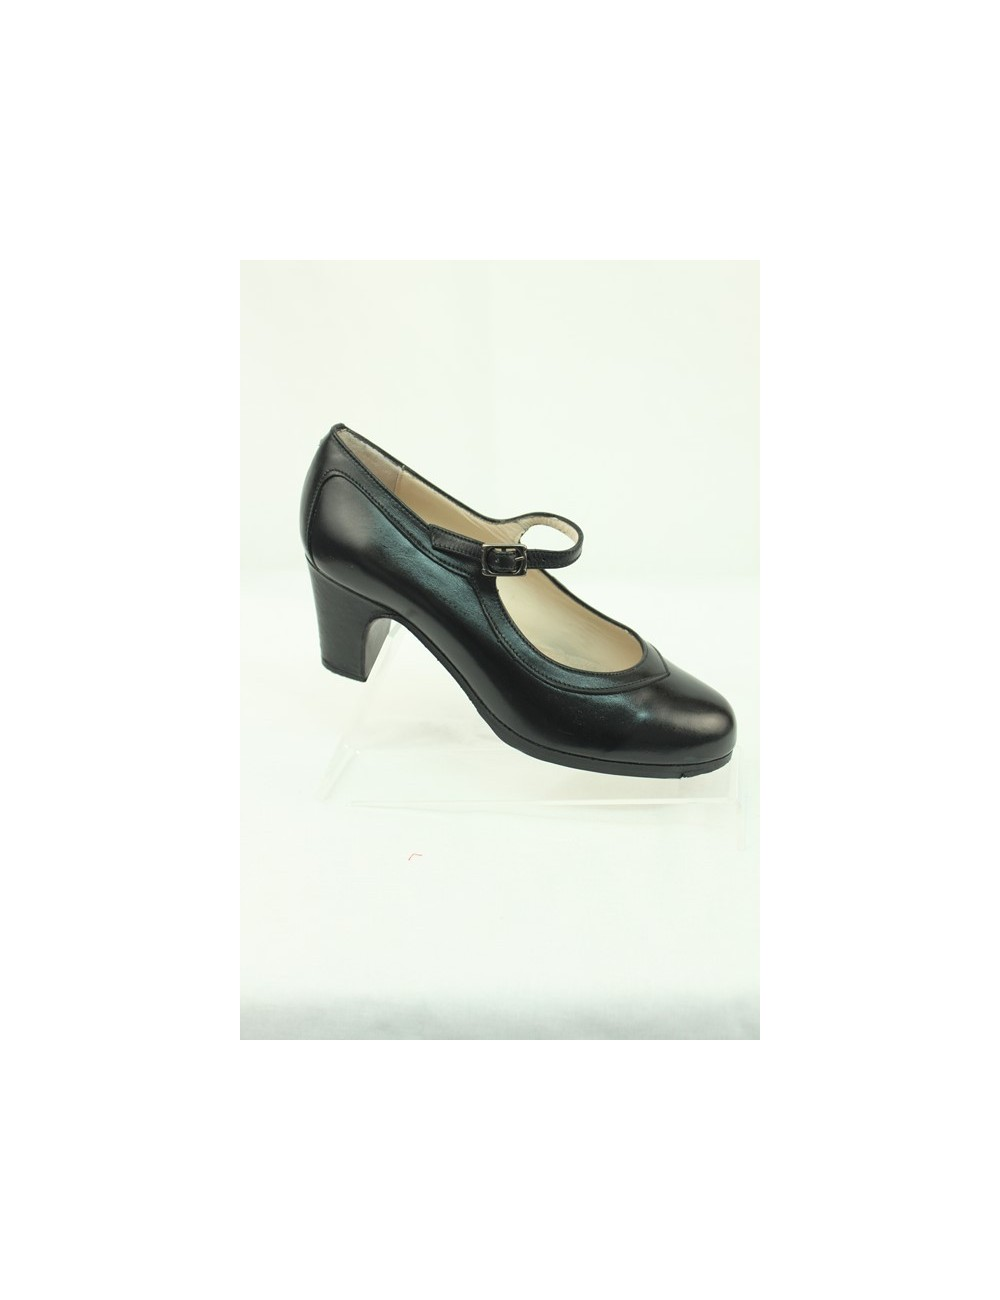 Chaussures de flamenco Begona Correa M01 noires